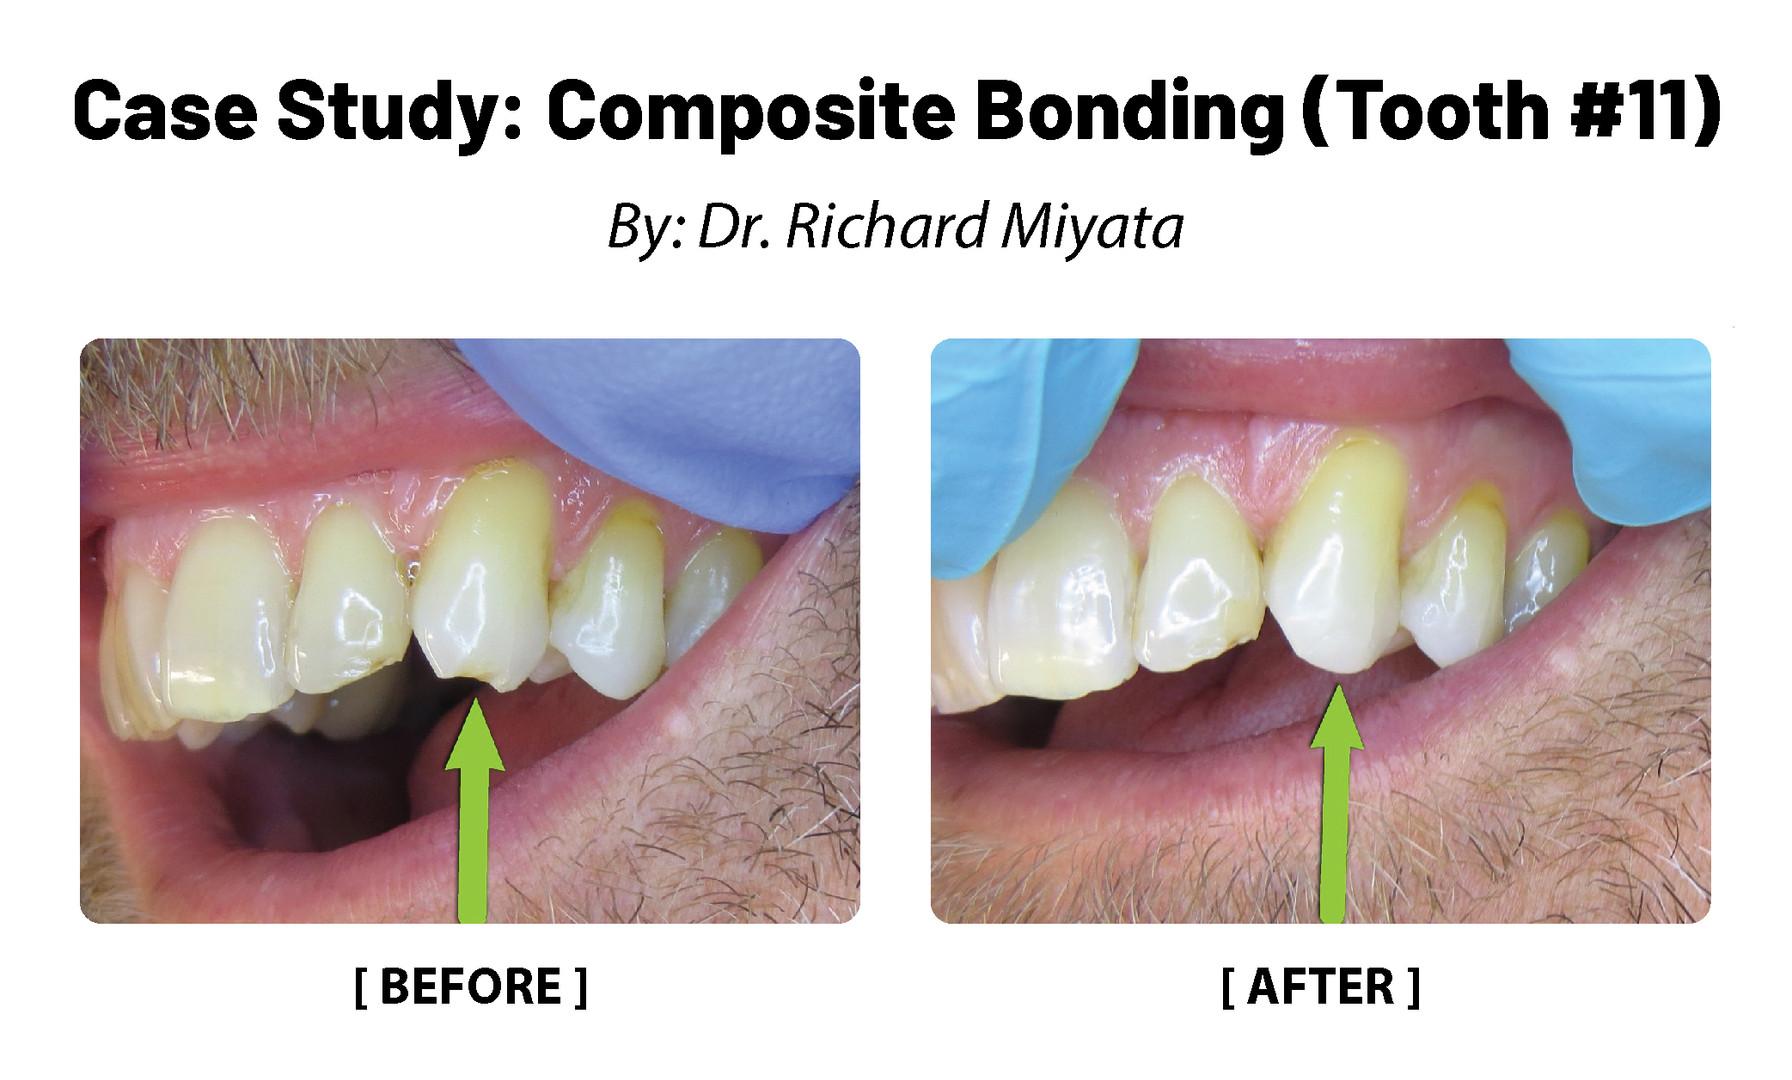 Case Study: Composite Bonding (Tooth 11)